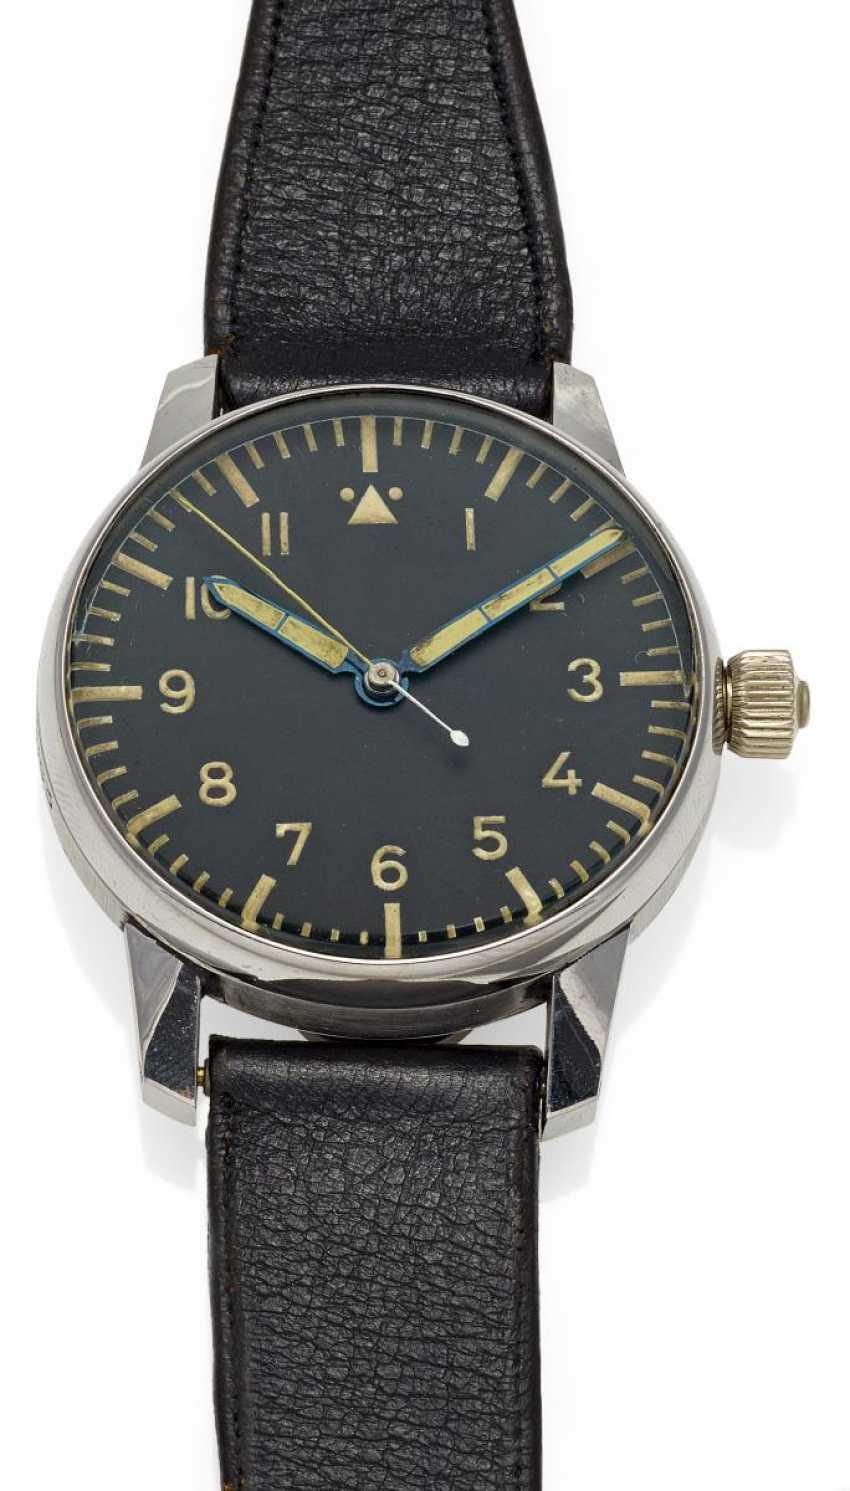 Wrist Watch, A. Lange & Söhne, Germany. - photo 1